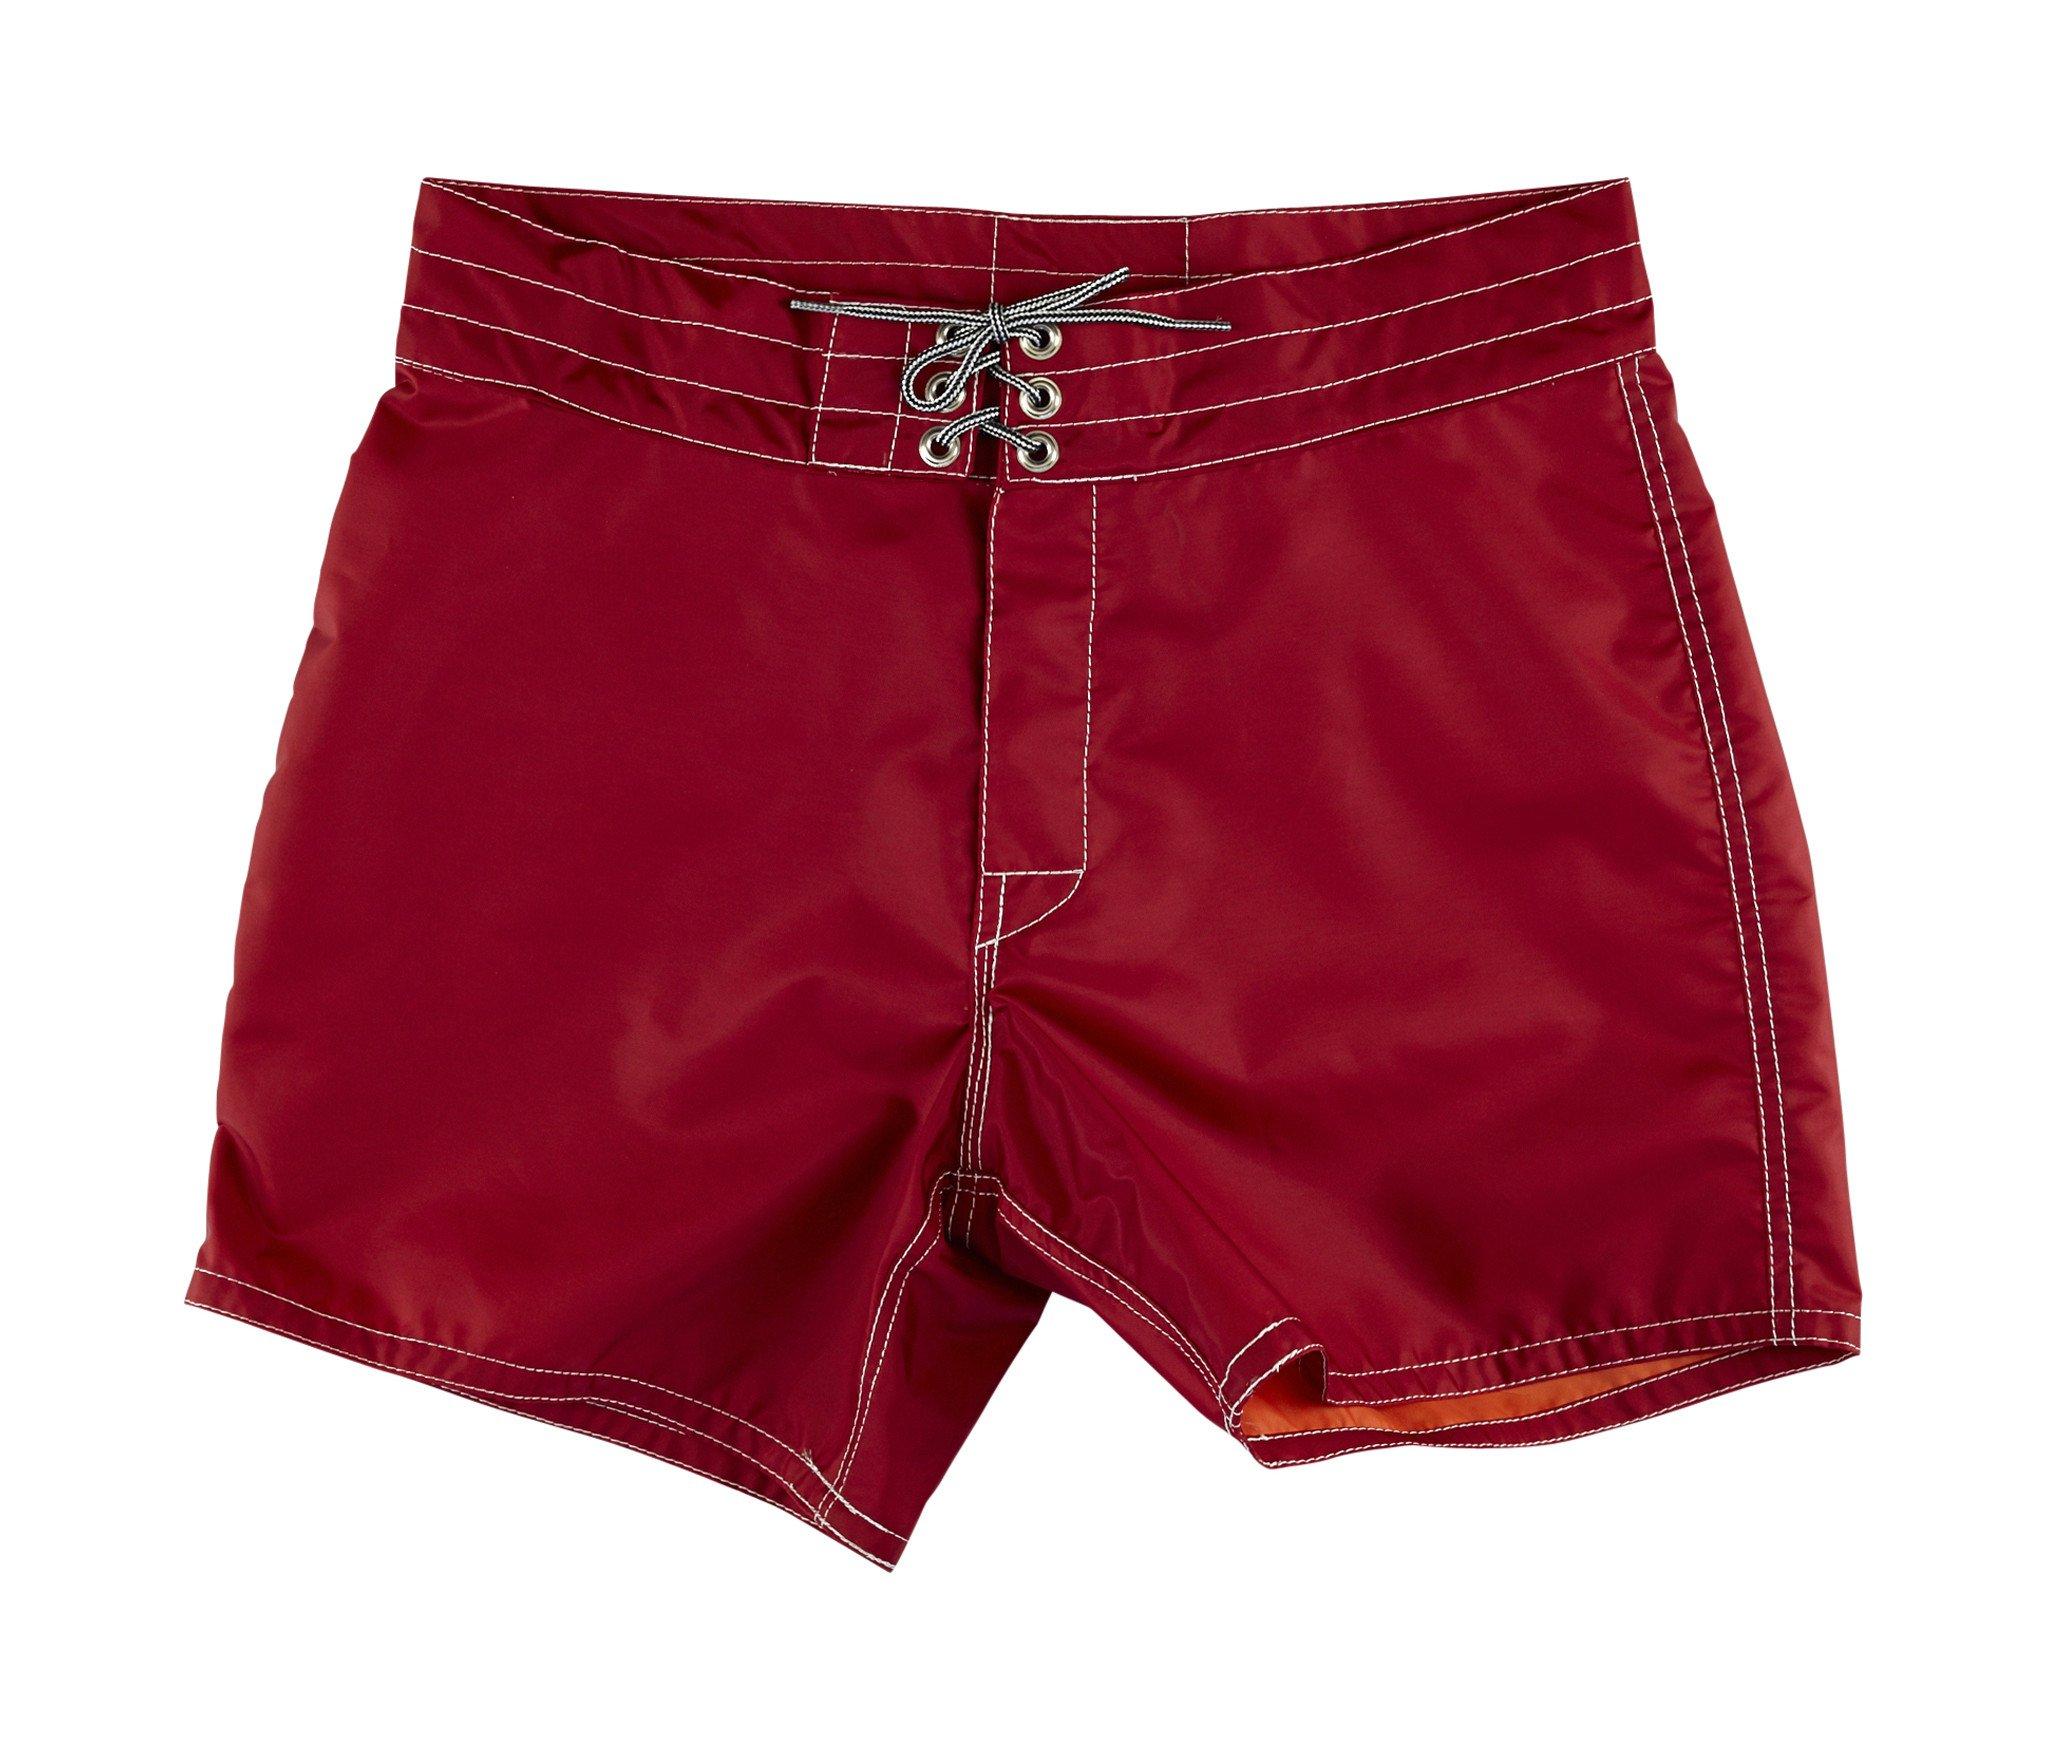 Birdwell Beach Britches Style 310 (Red, 34)